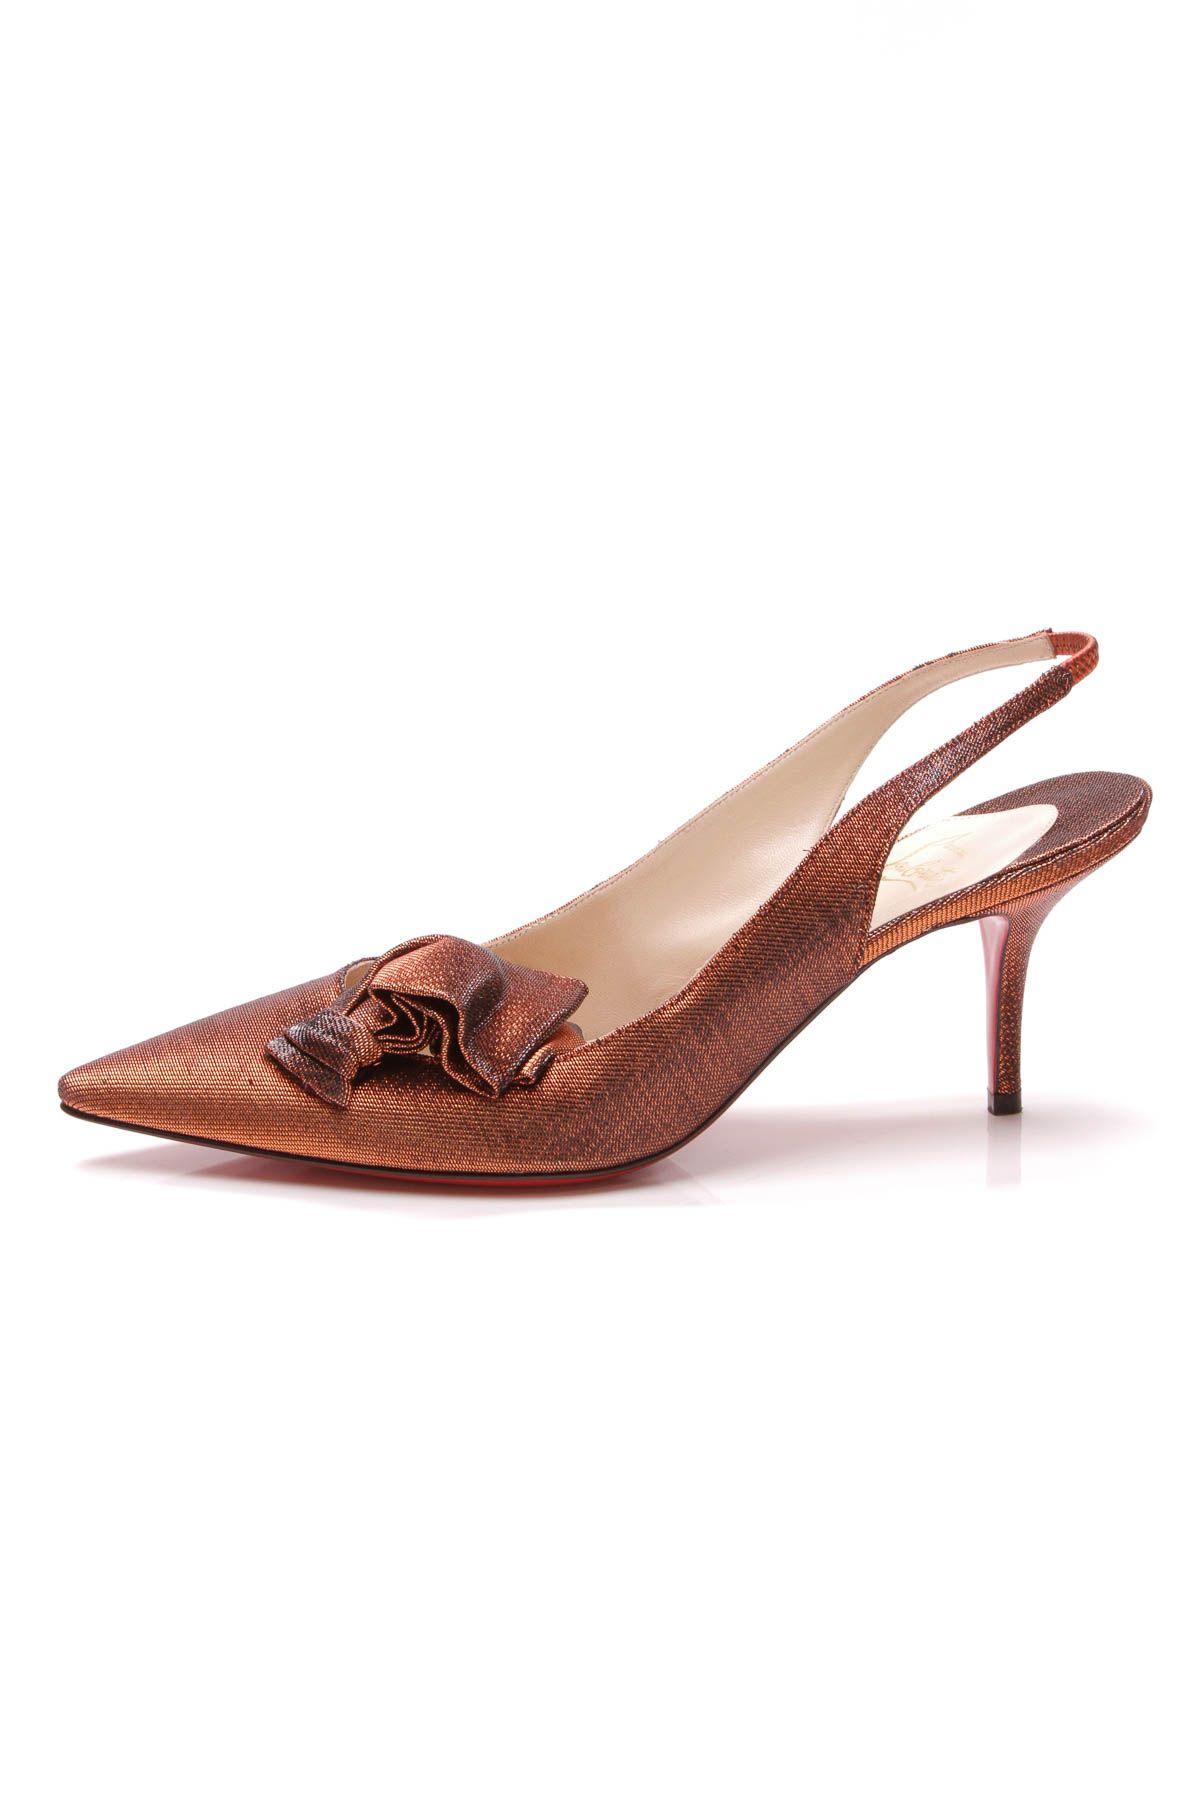 a3eaff10e5fe Christian Louboutin Lady Cukor Slingback Heels - Metallic Orange Manolo  Blahnik